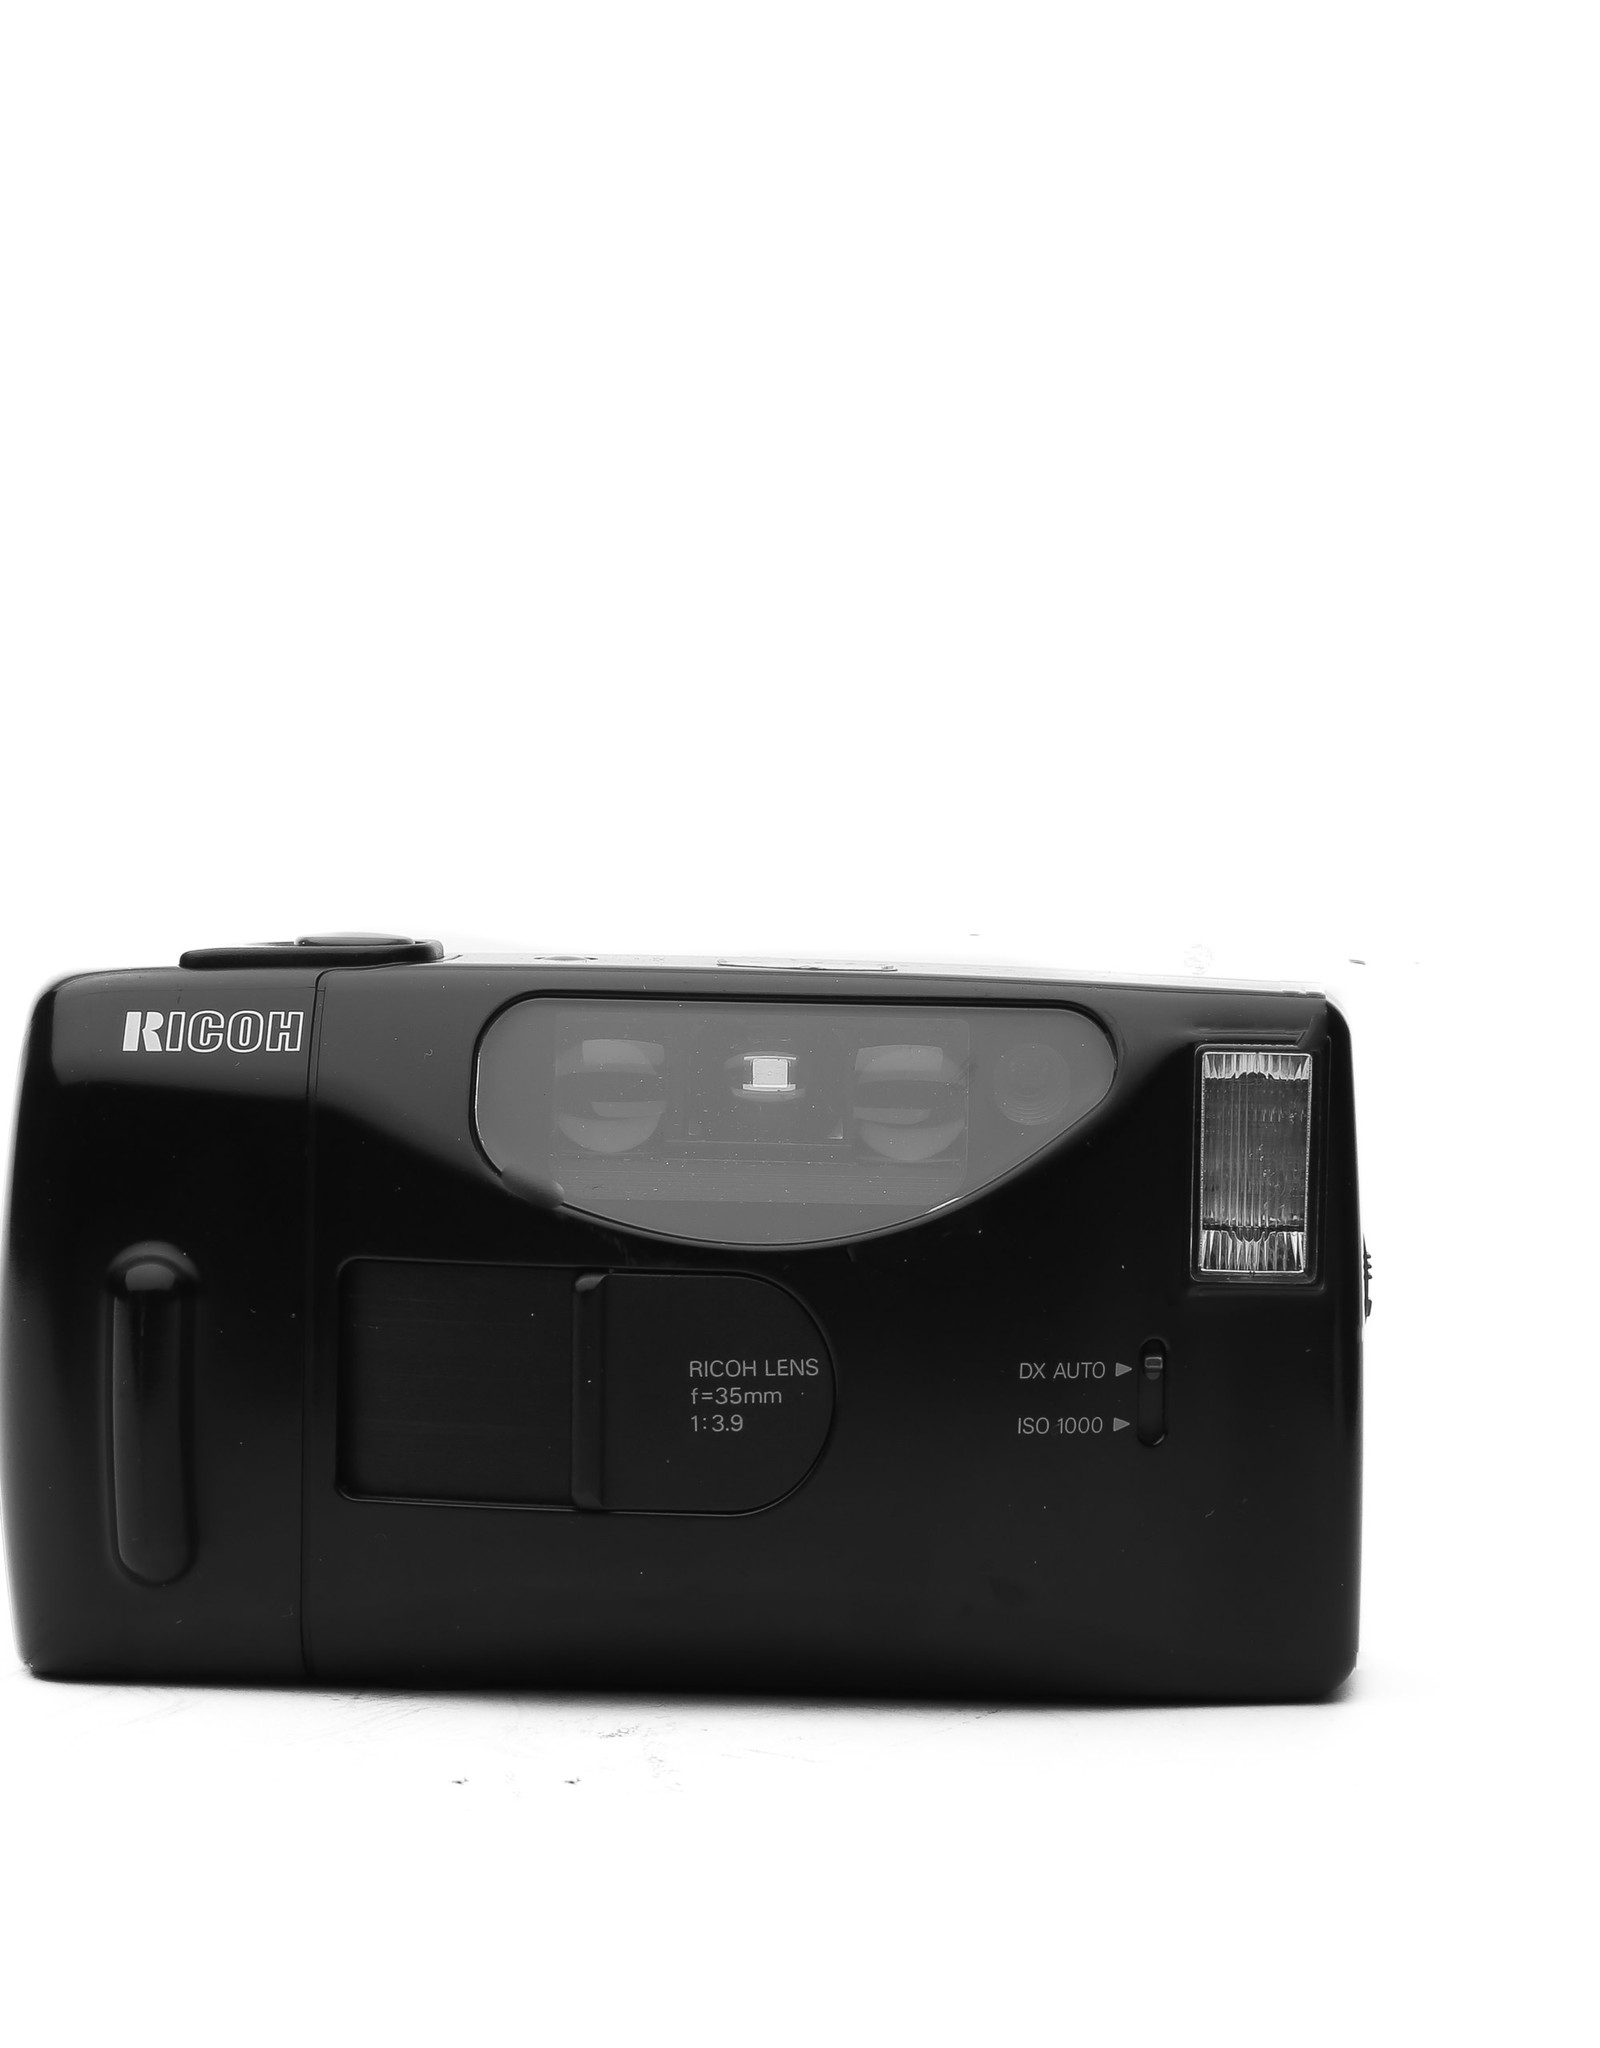 Ricoh Ricoh s30AF SuperCompact 35mm Camera